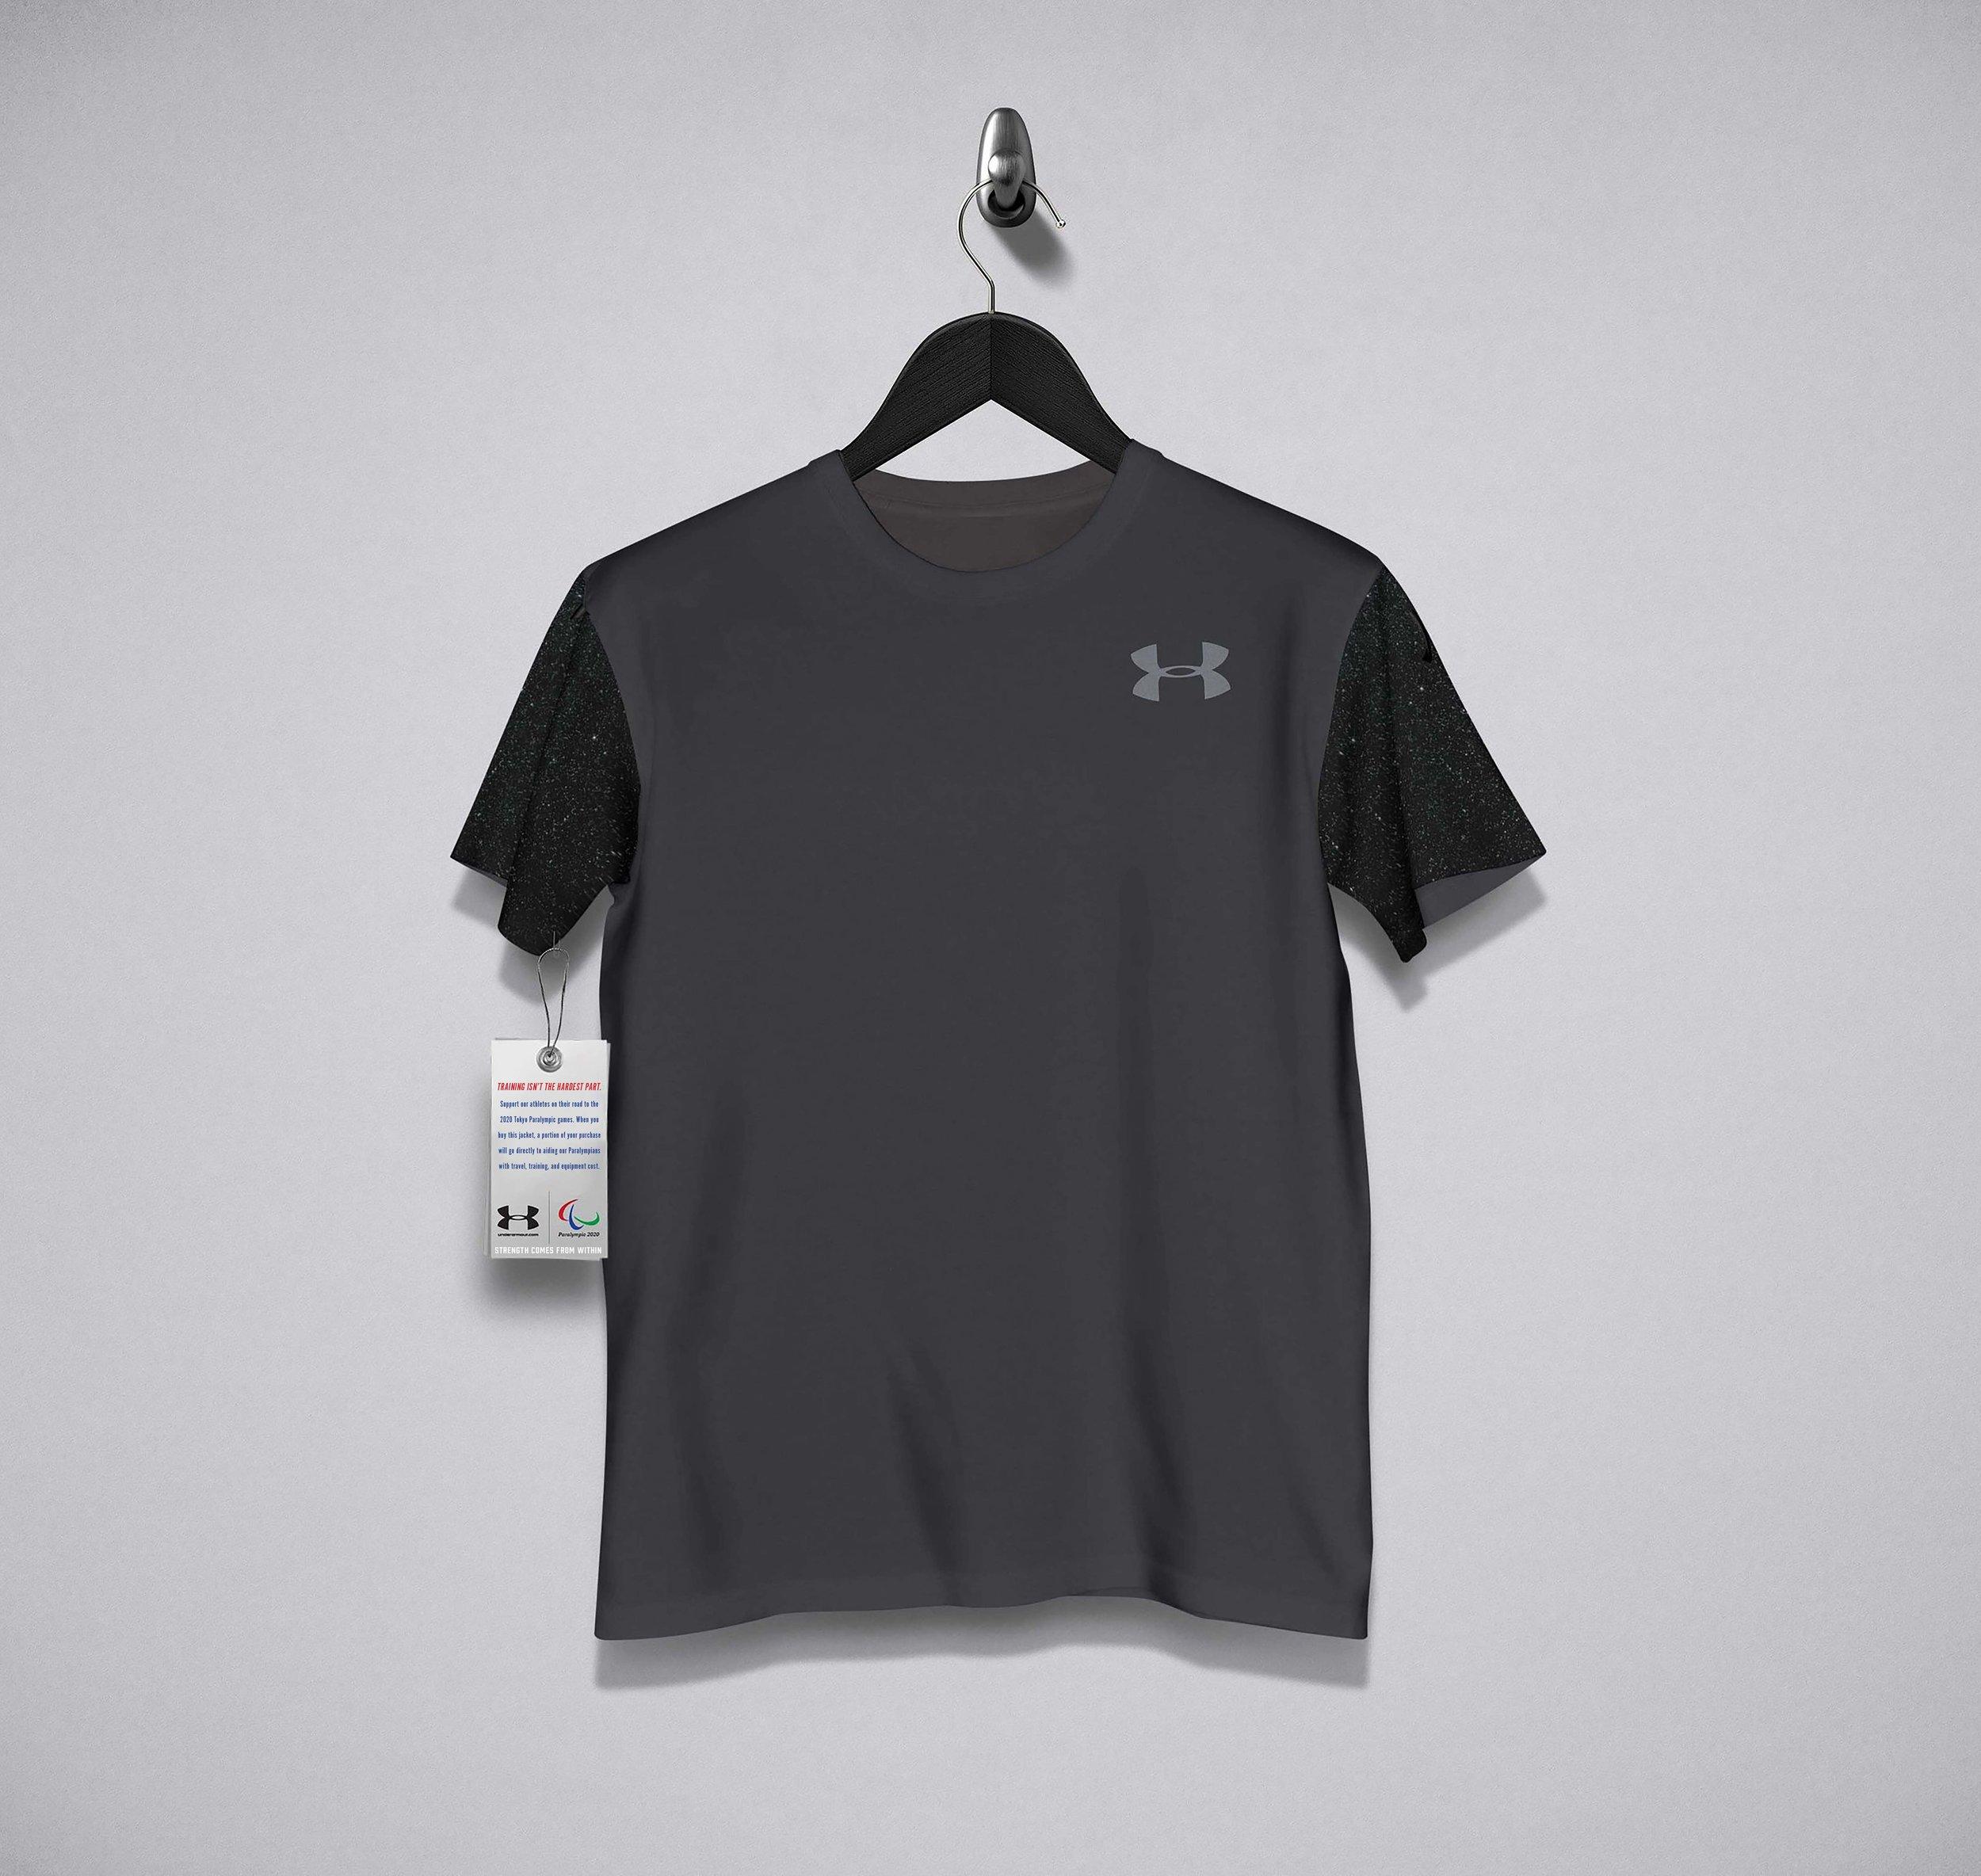 shirt+olimpic.jpg+new 6.57.03 PM.jpg